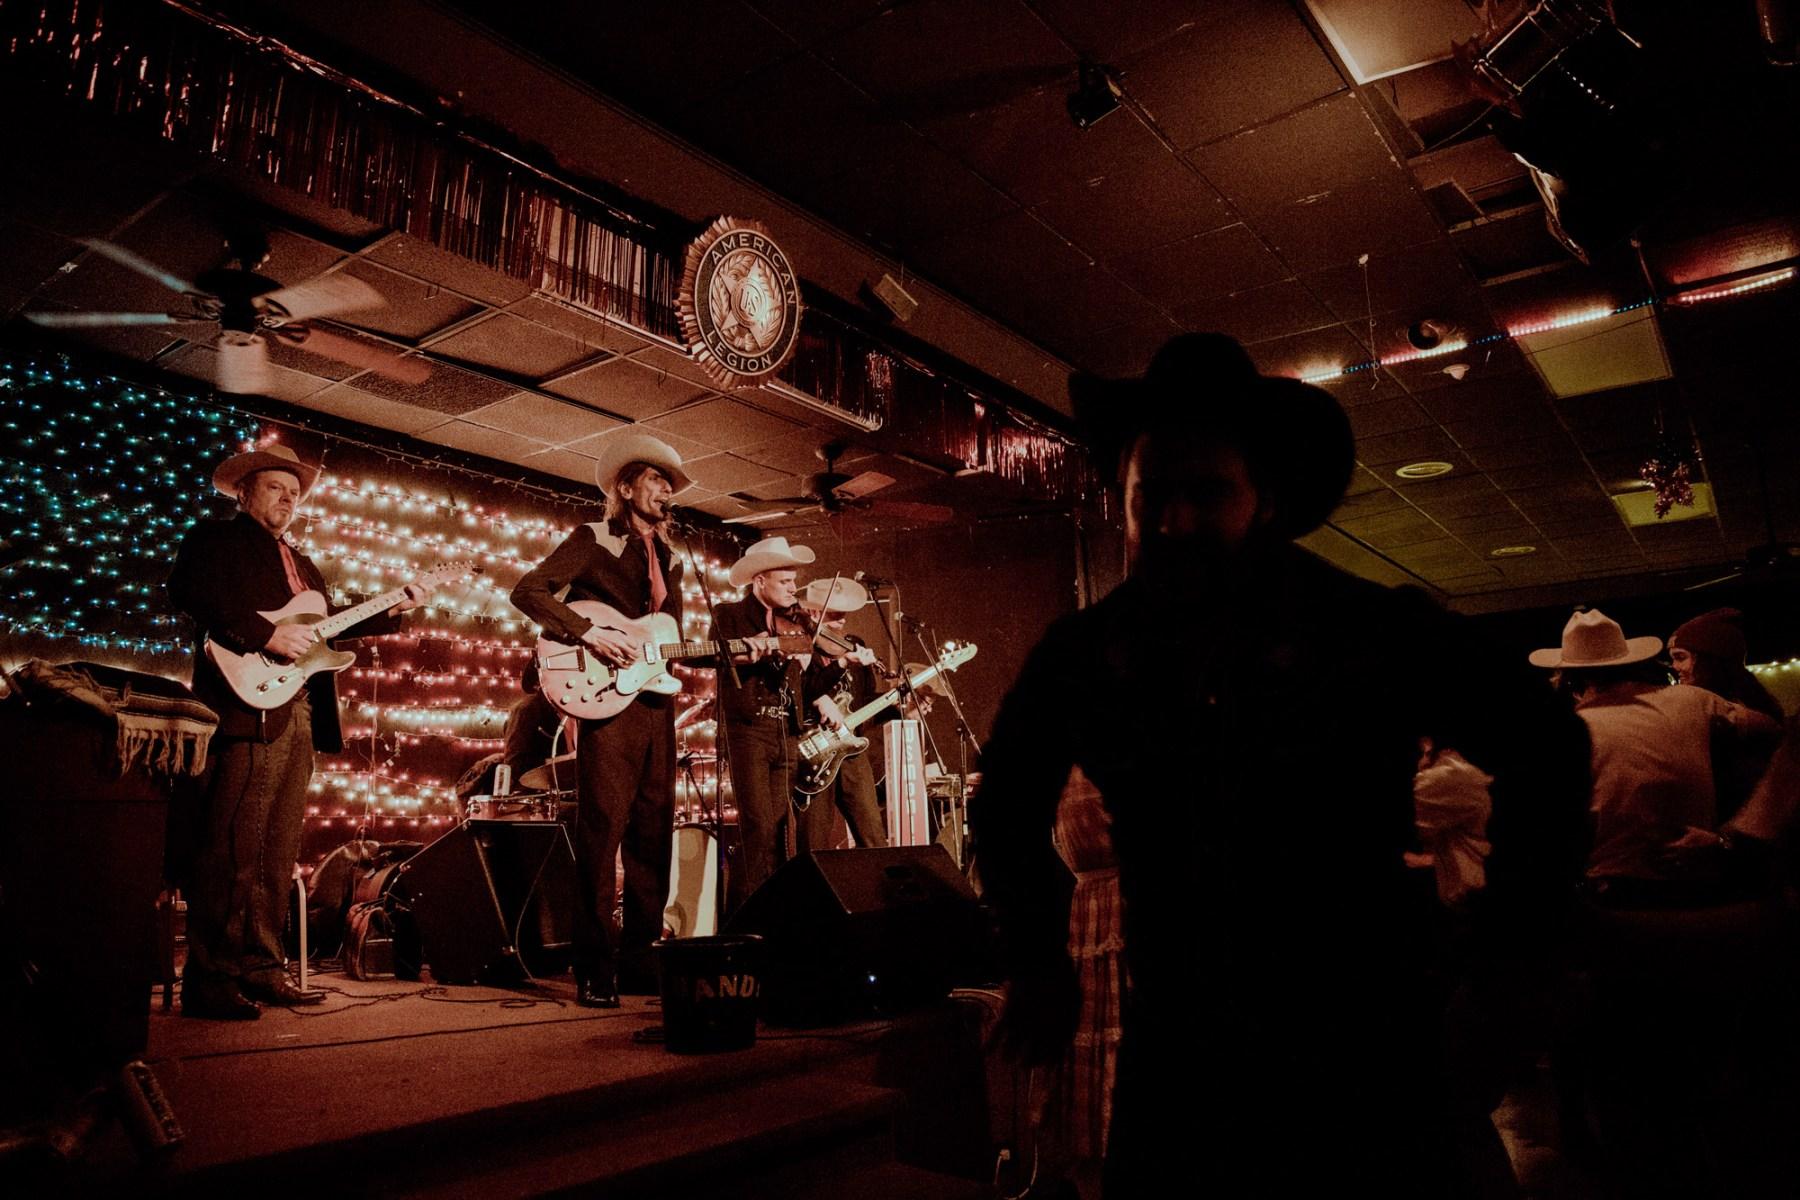 nashville music scene, hangouts, clubs, bars